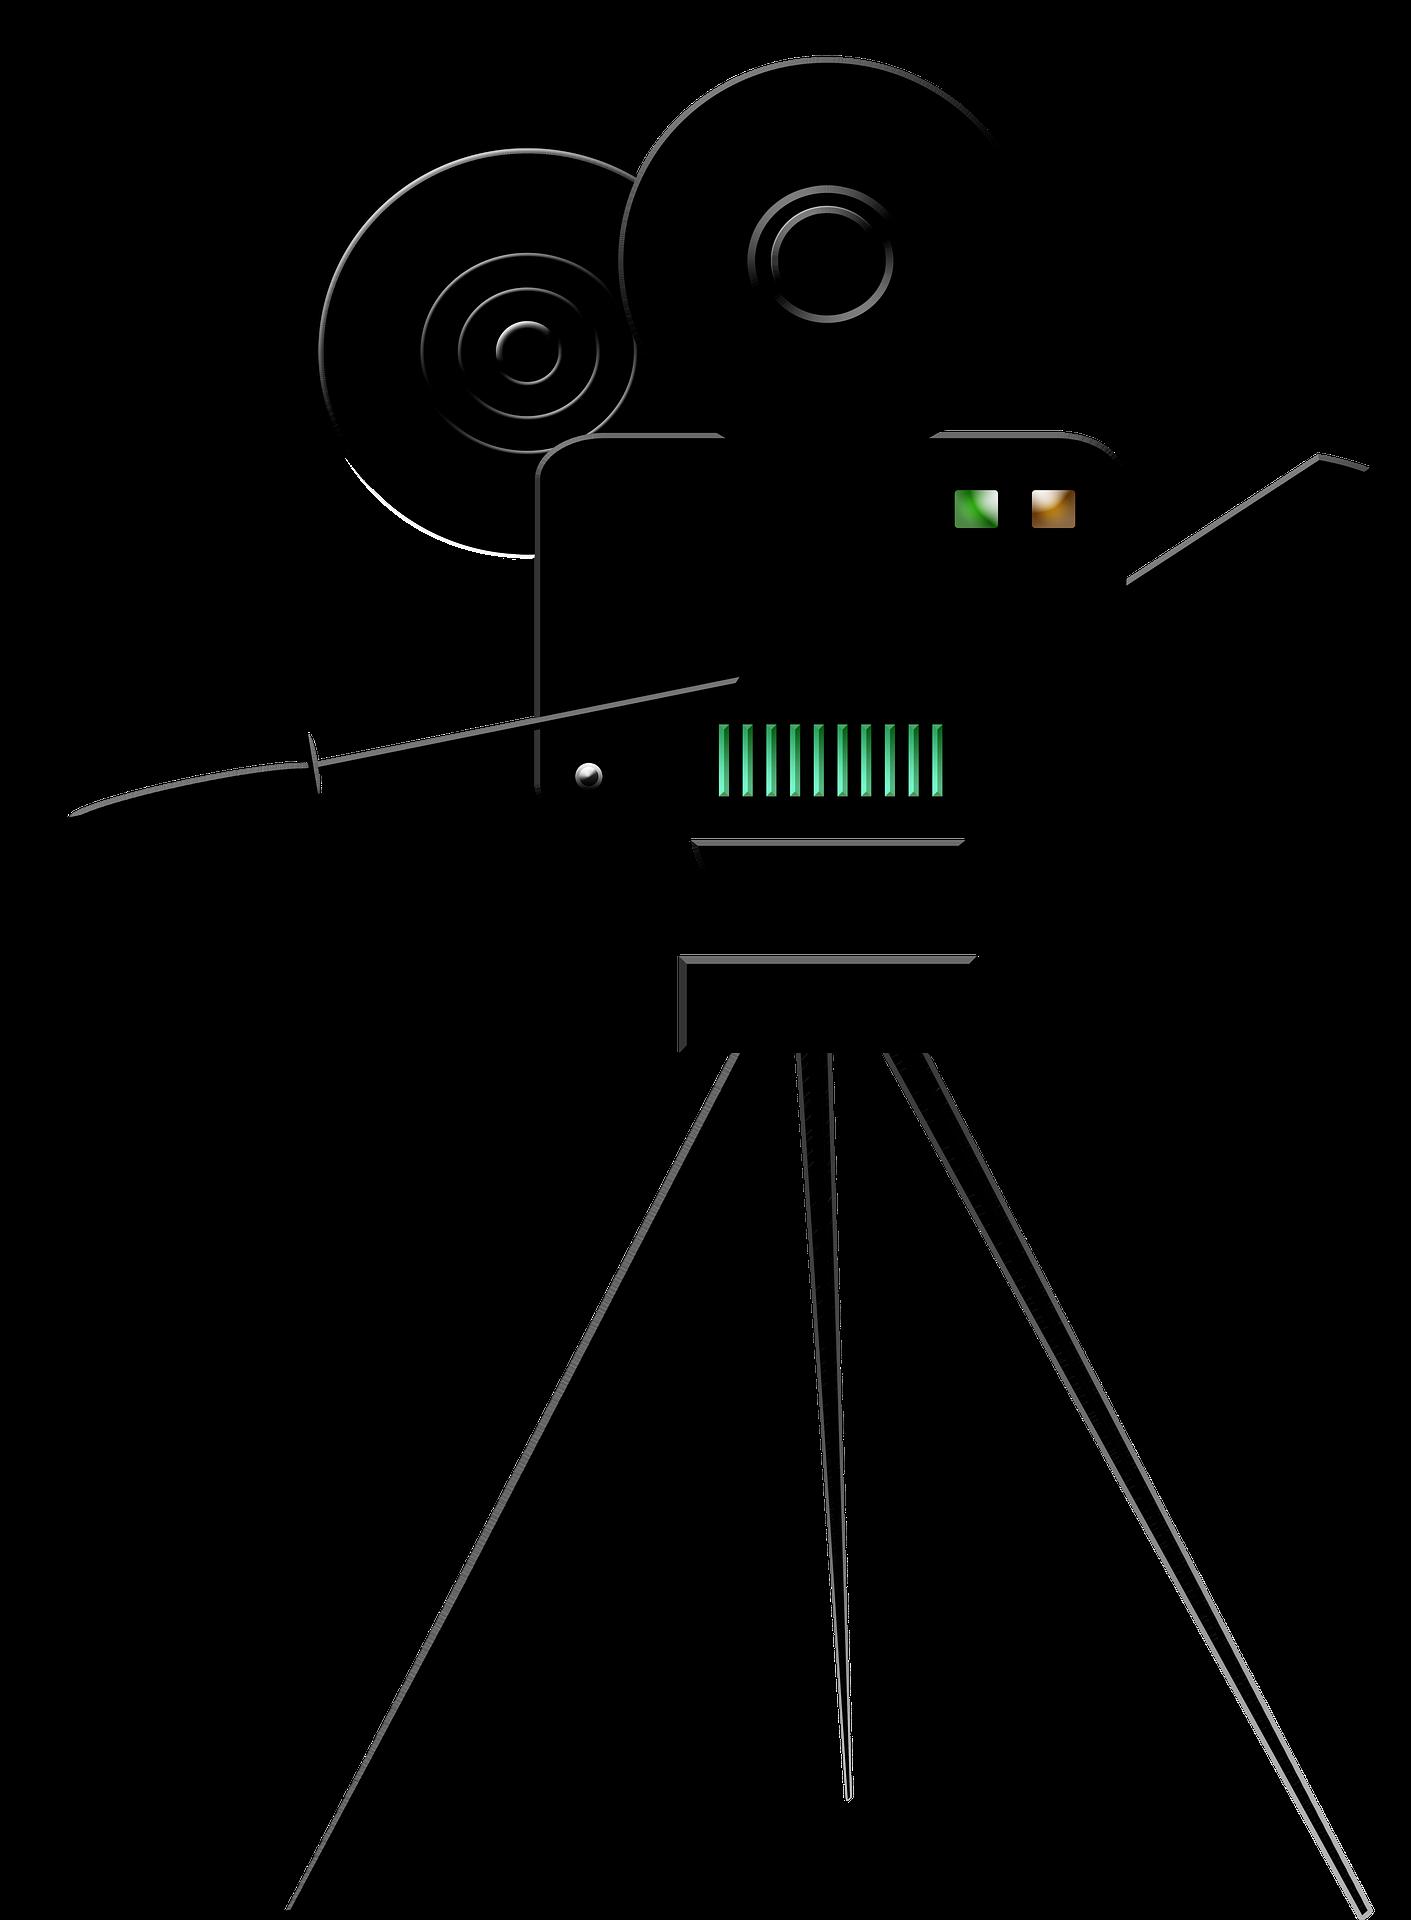 Movie clipart film viewing. Camera clip art black